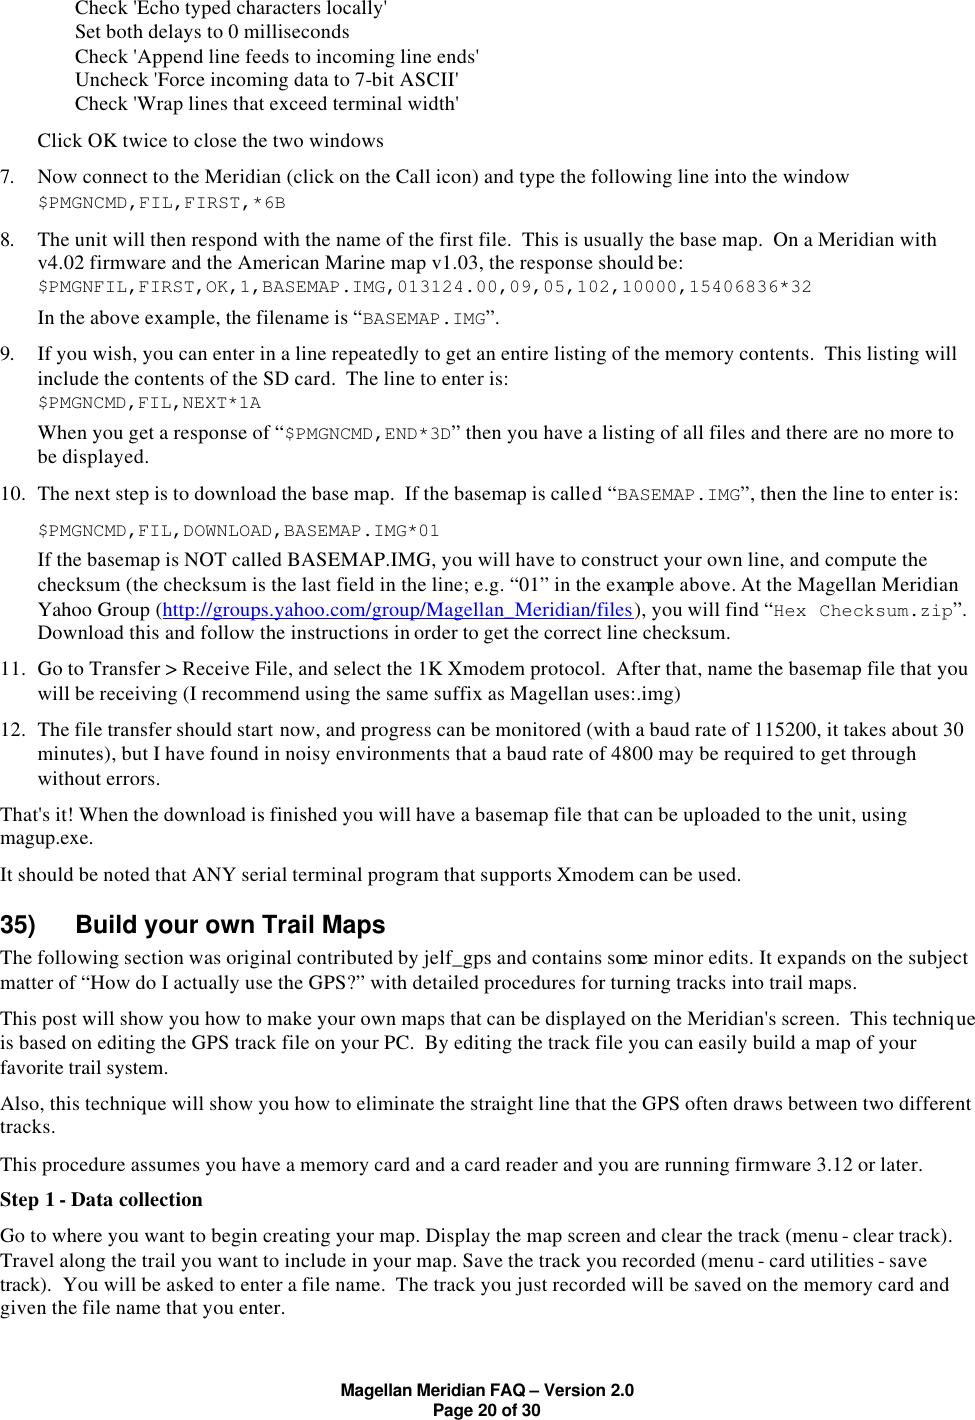 Magellan Meridian Faq Users Manual MeridianFAQv2_0